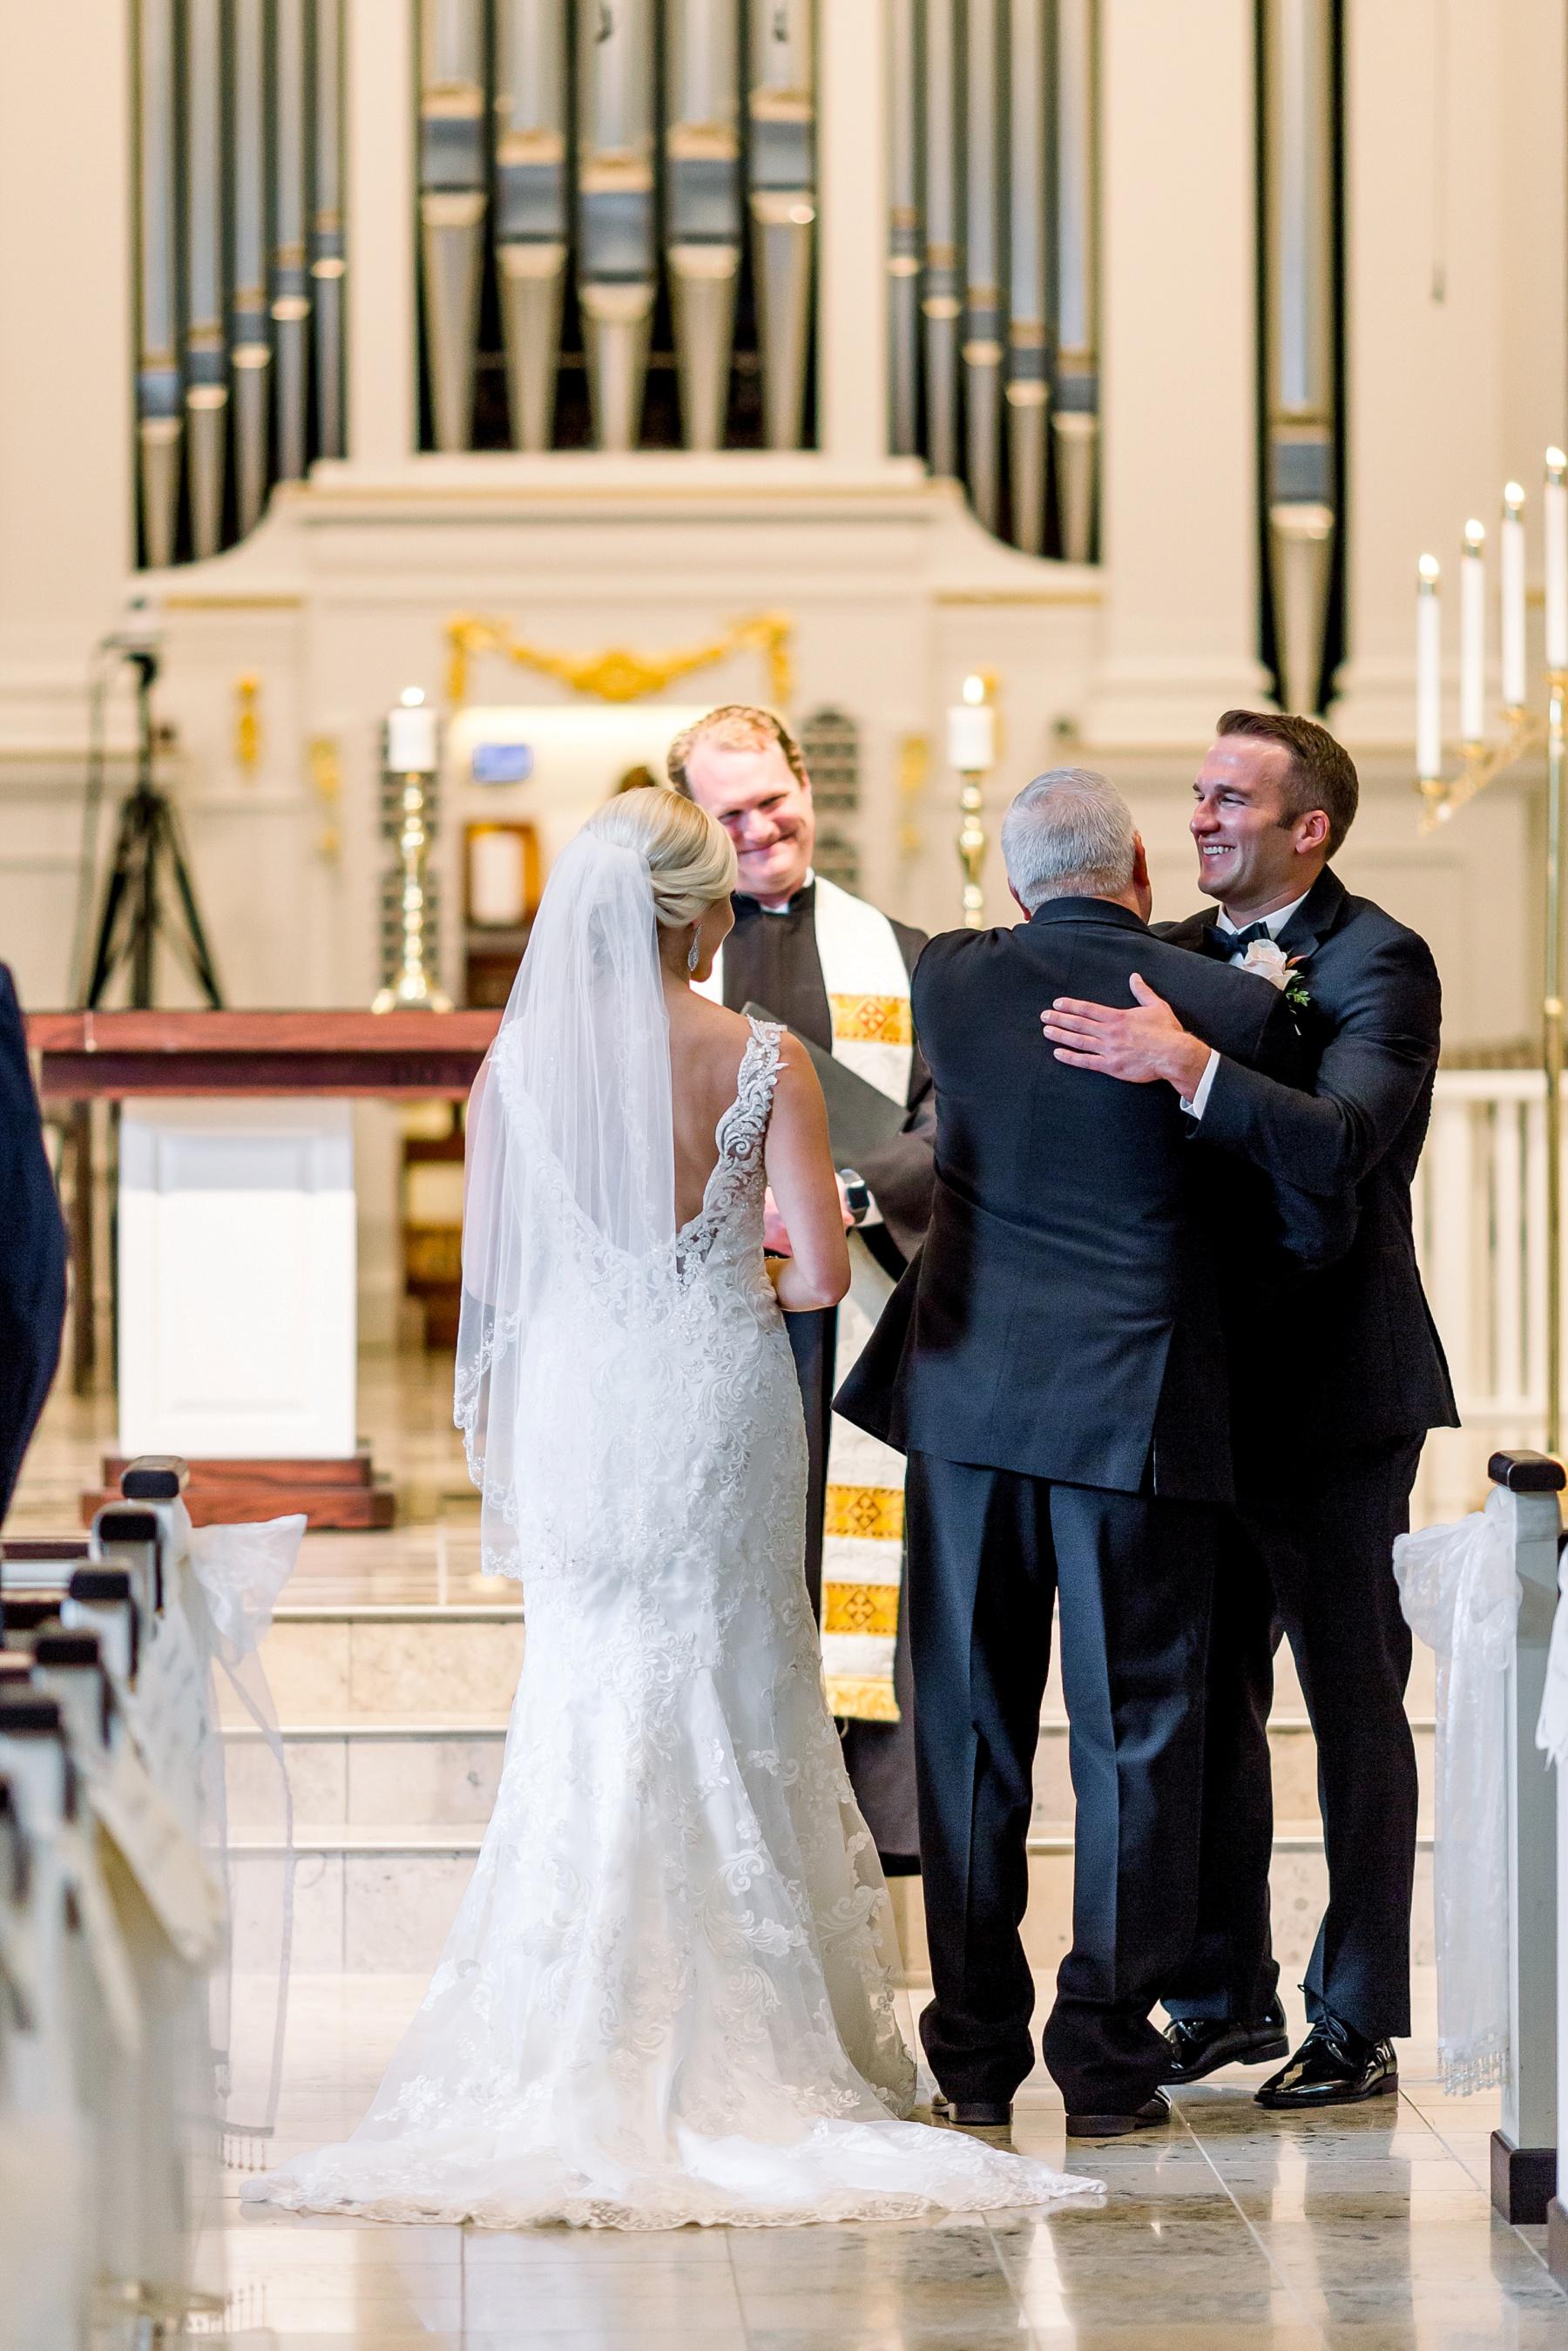 midwest-adventurous-wedding-photographer-elizabeth-ladean-photography-photo_4762.jpg